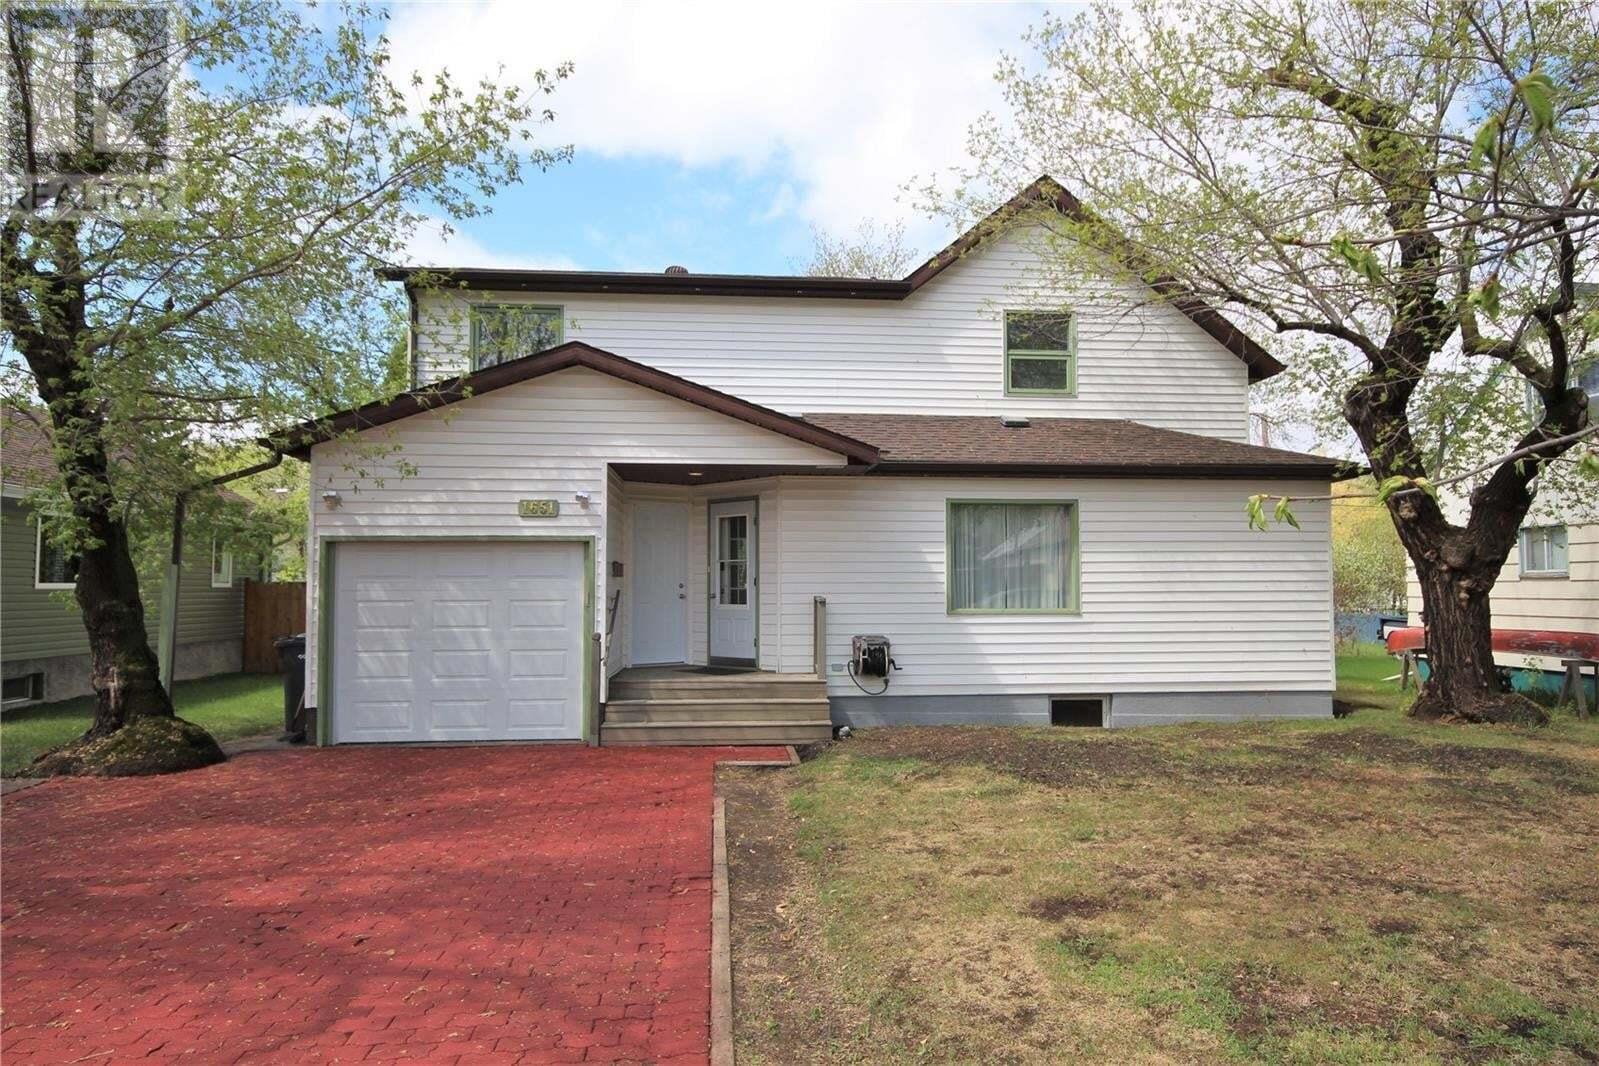 House for sale at 1651 98th St North Battleford Saskatchewan - MLS: SK809371